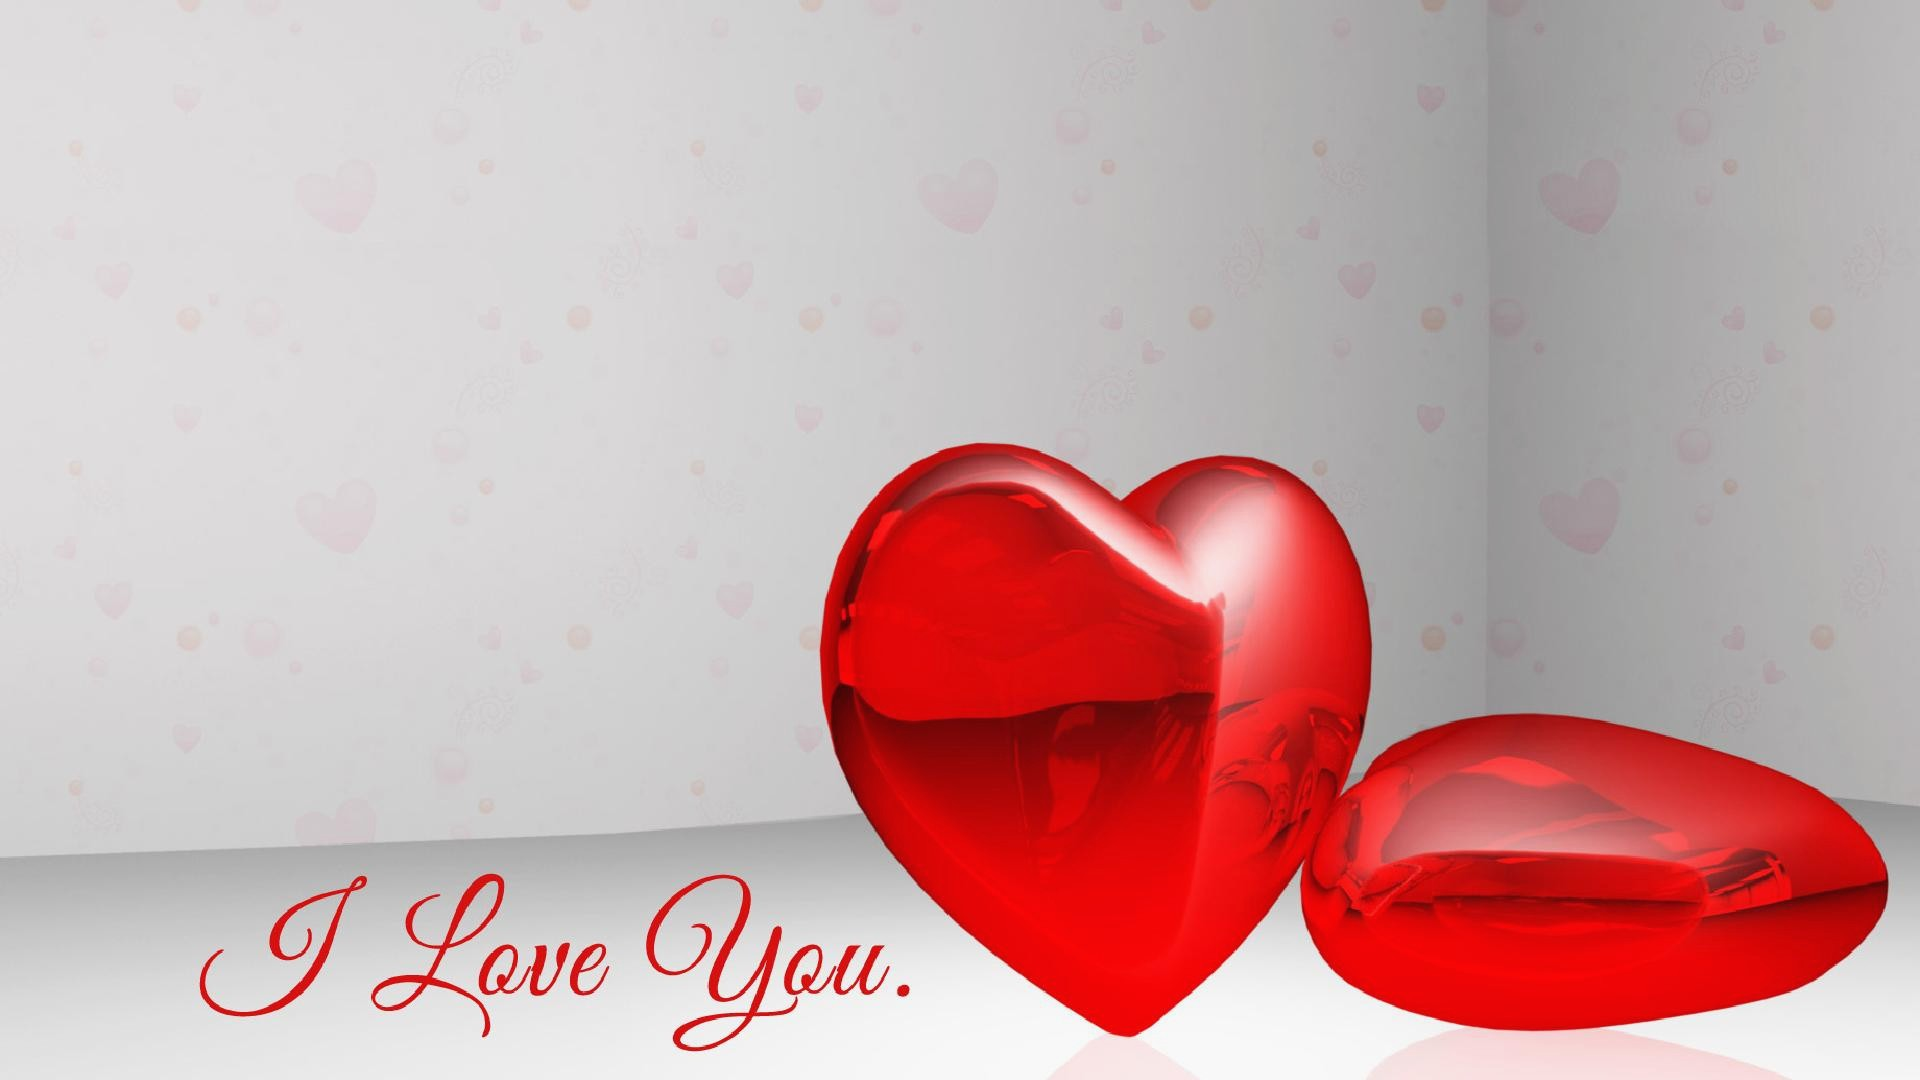 I Love You Wallpaper 3d Love U Wallpapers Latest 36722 Hd Wallpaper Backgrounds Download